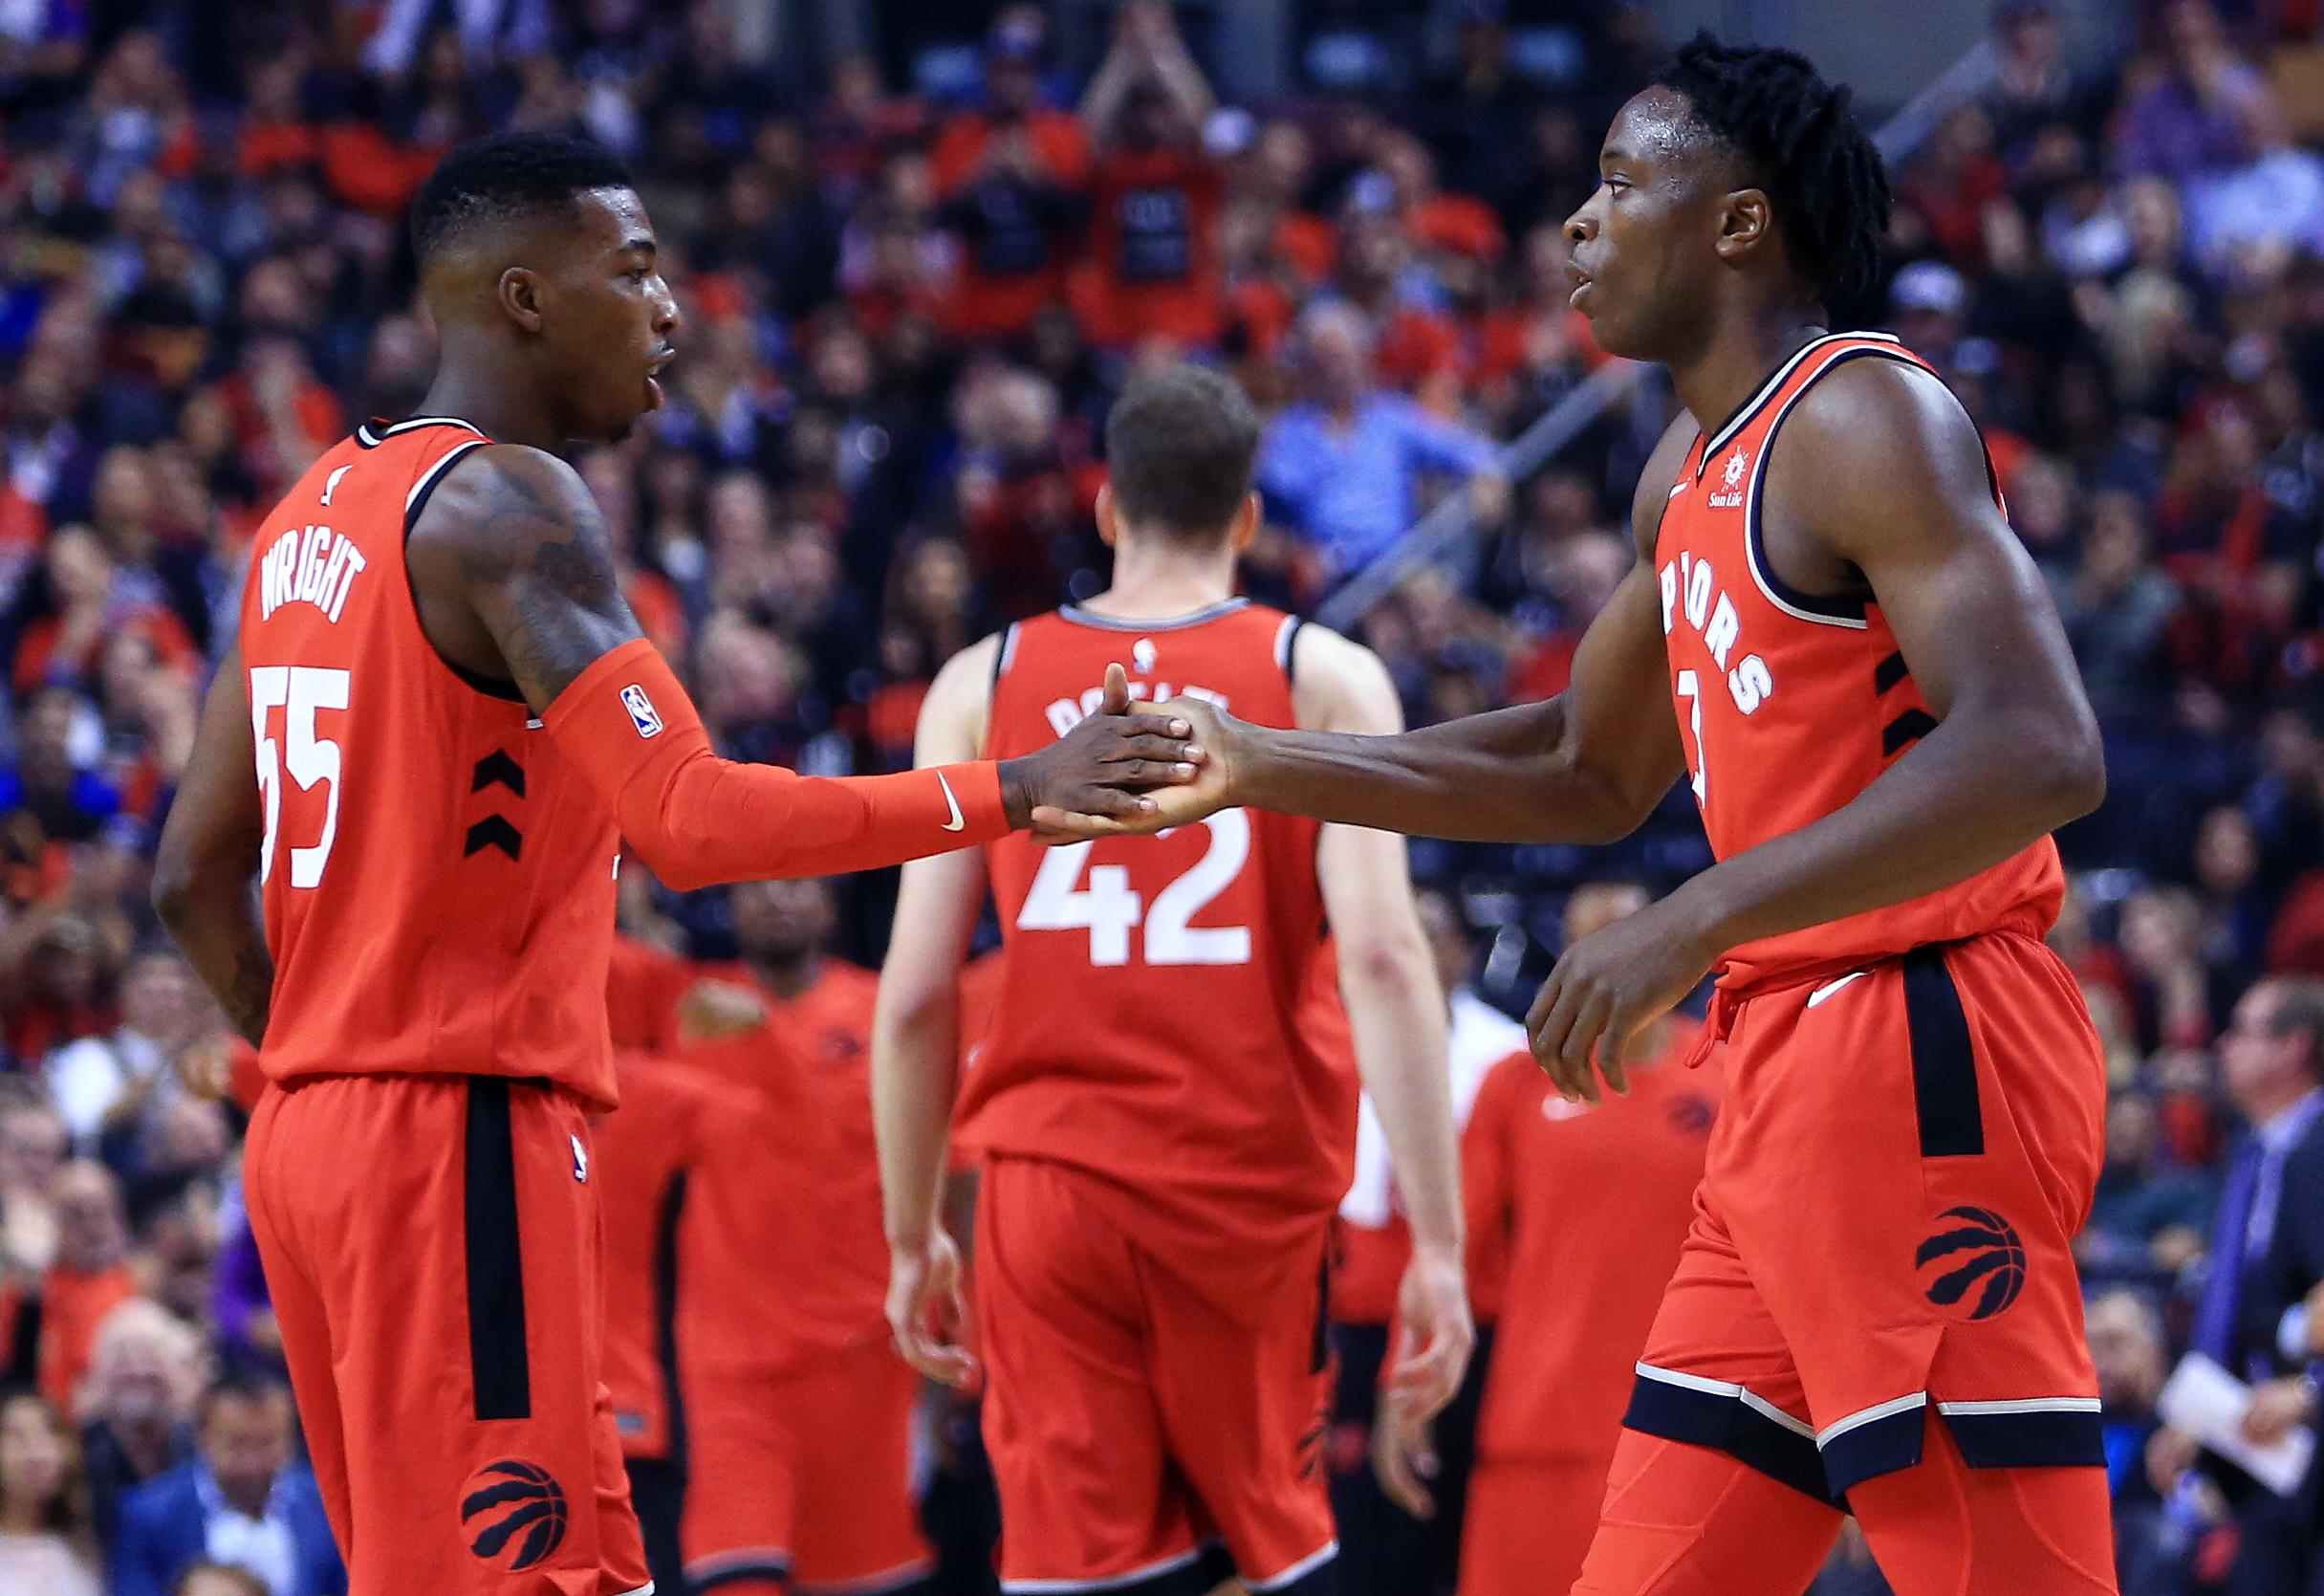 Toronto Raptors: Toronto Raptors Bench Players Deserving Of More Minutes